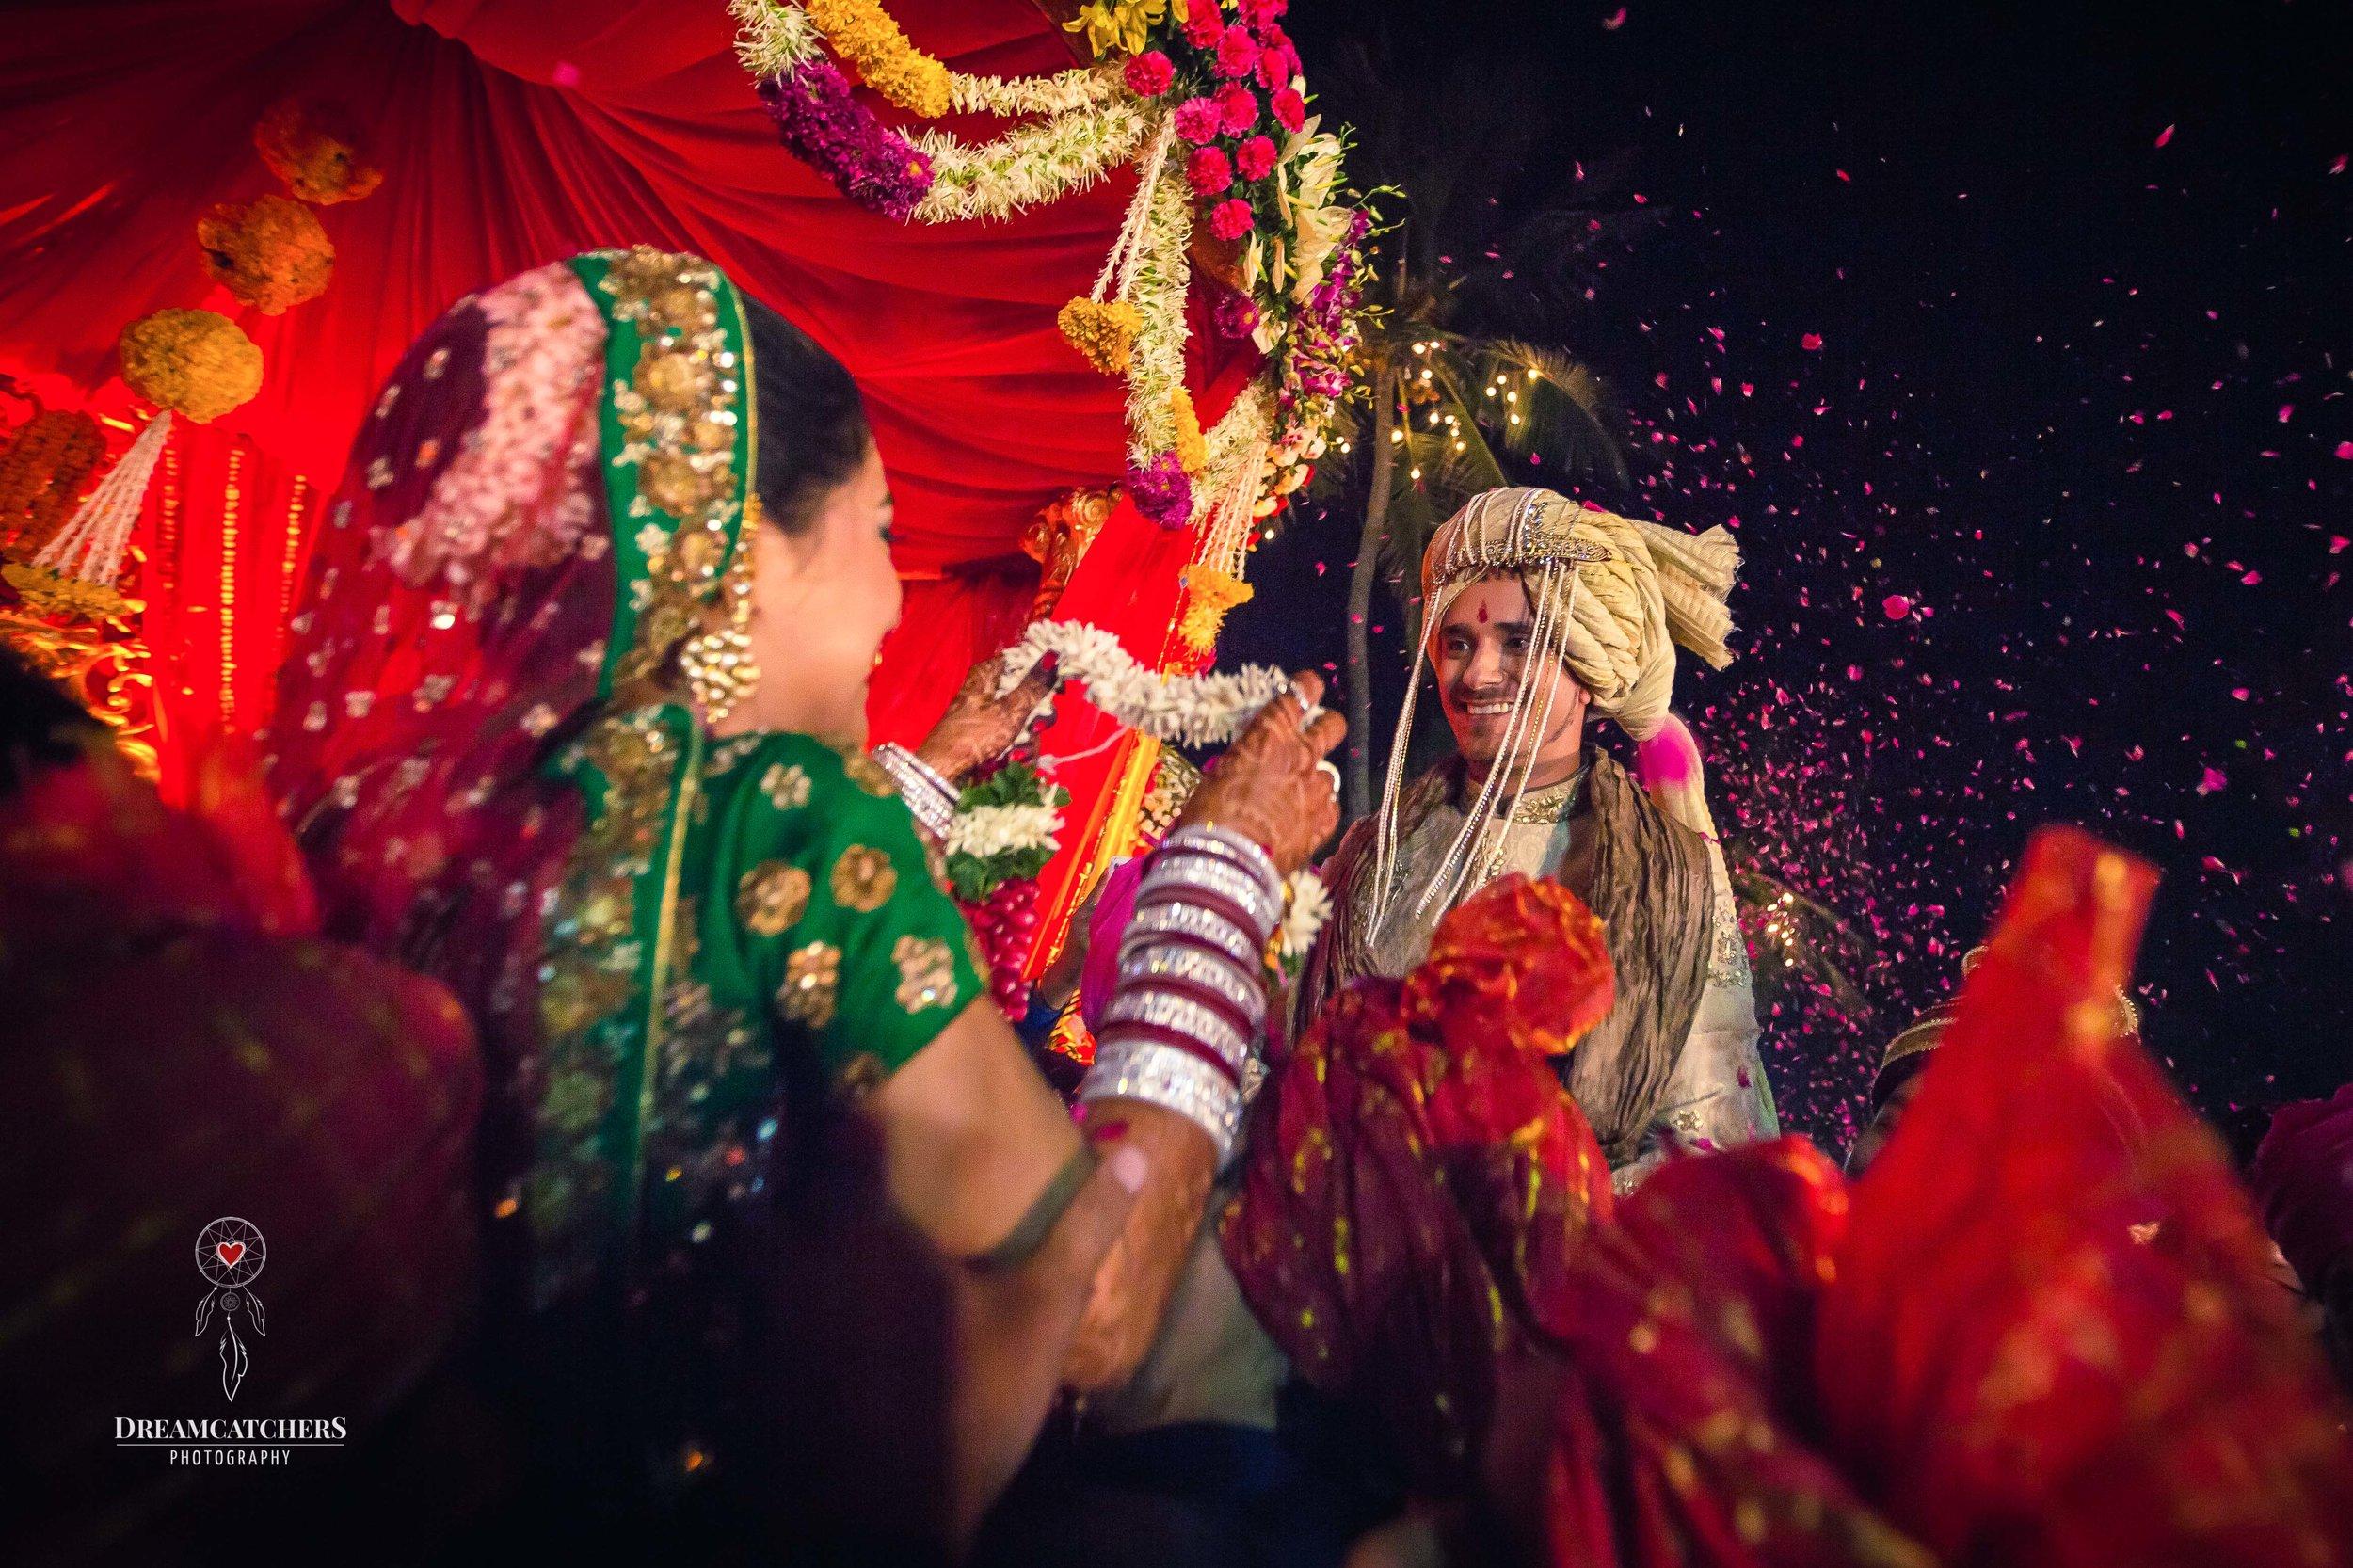 Amita+Raghav_Dreamcatchers Photography-24.jpg